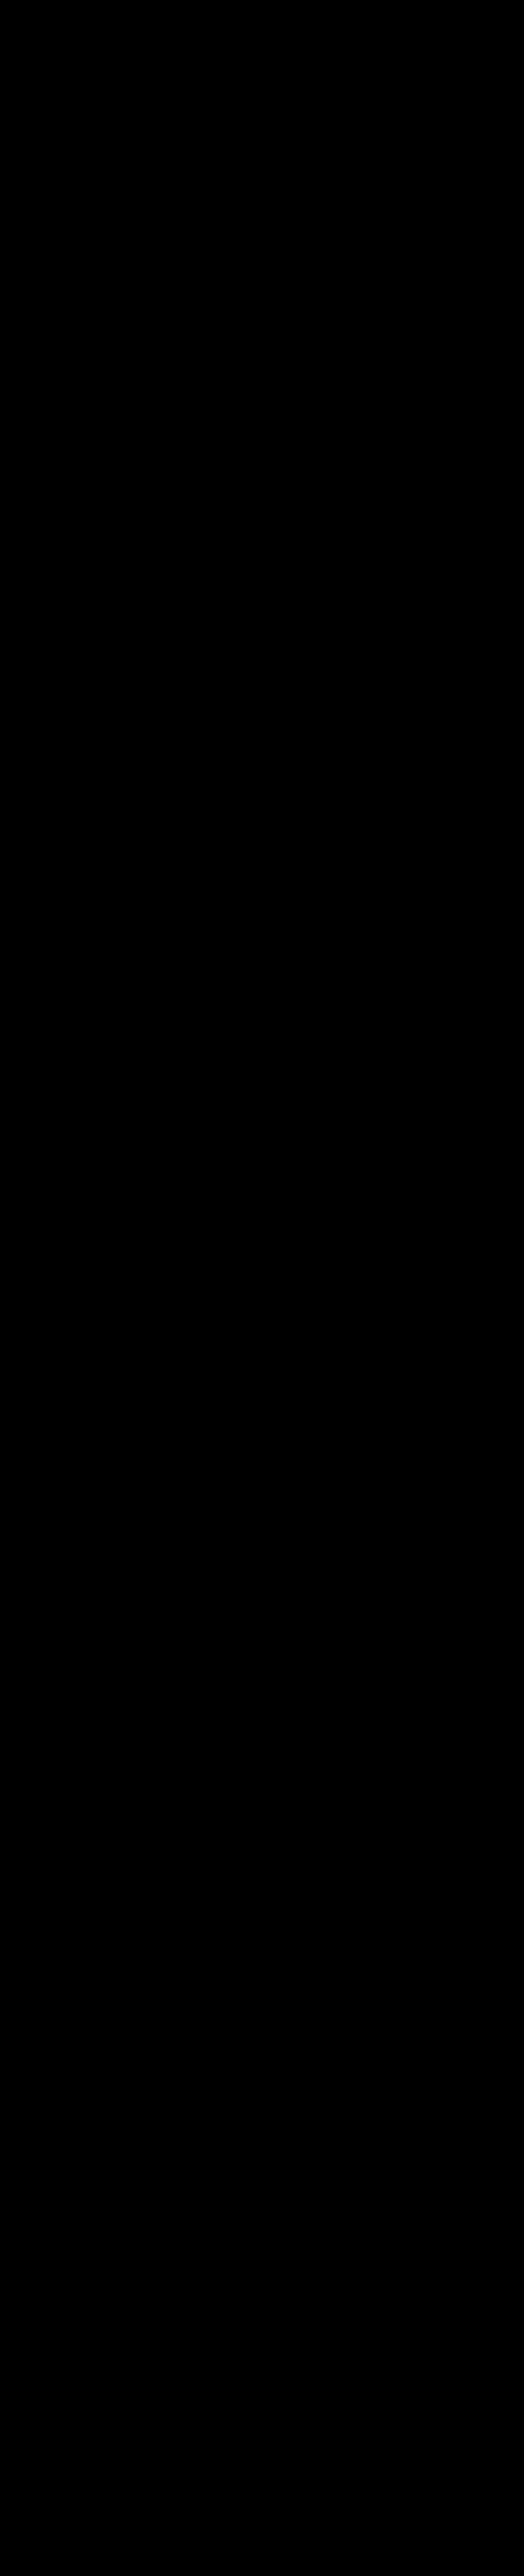 decoration curve Clipart illustration in PNG, SVG